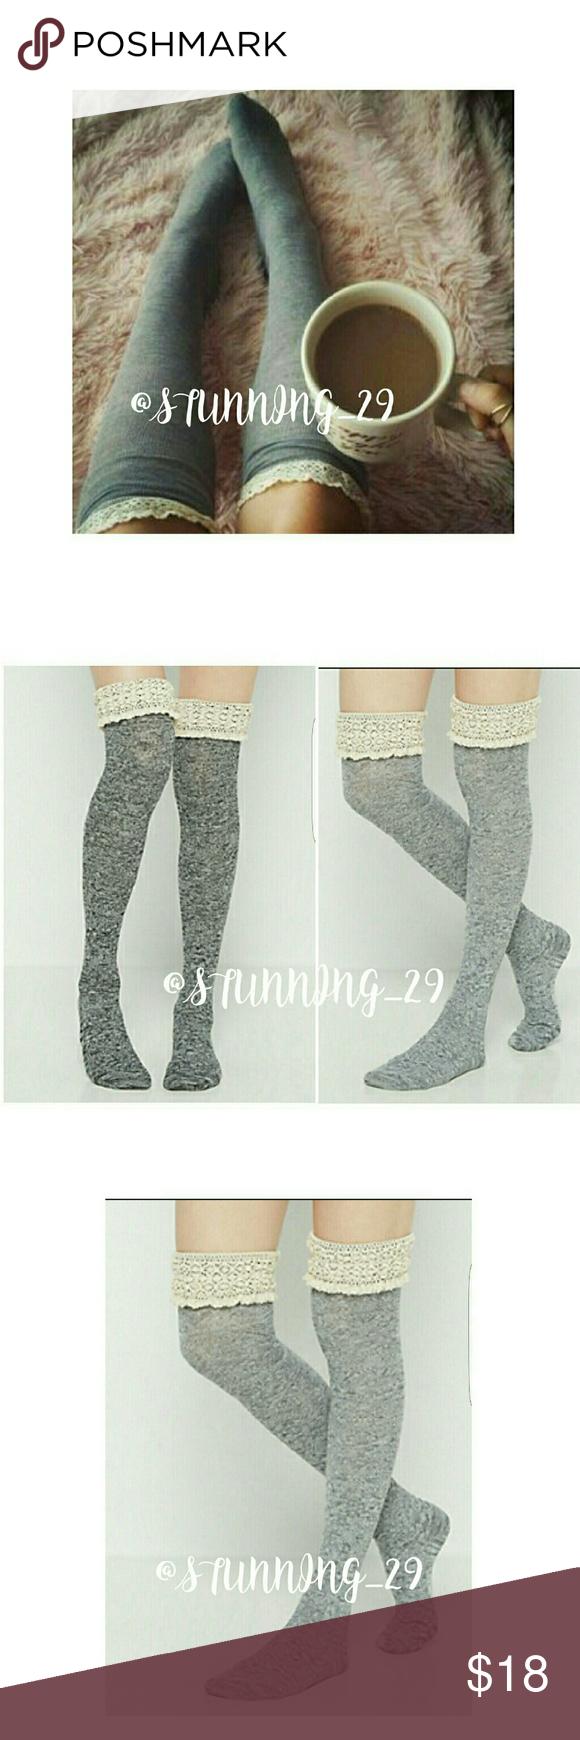 Grey Lace Top Marbled Otk Socks Grey Lace Top Otk Socks Otk